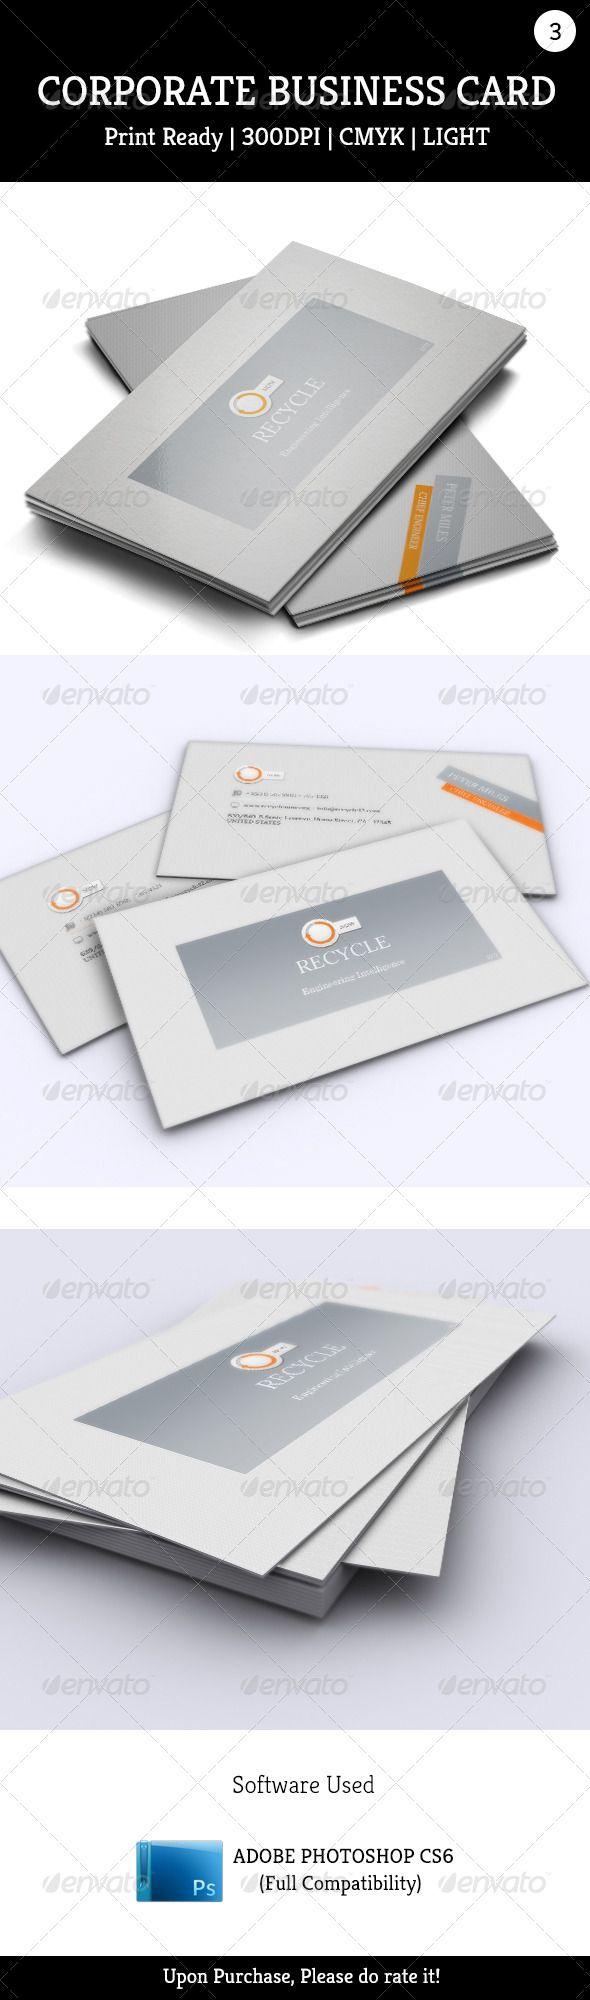 Ms de 25 ideas increbles sobre standard business card size en corporate business card 003 magicingreecefo Image collections